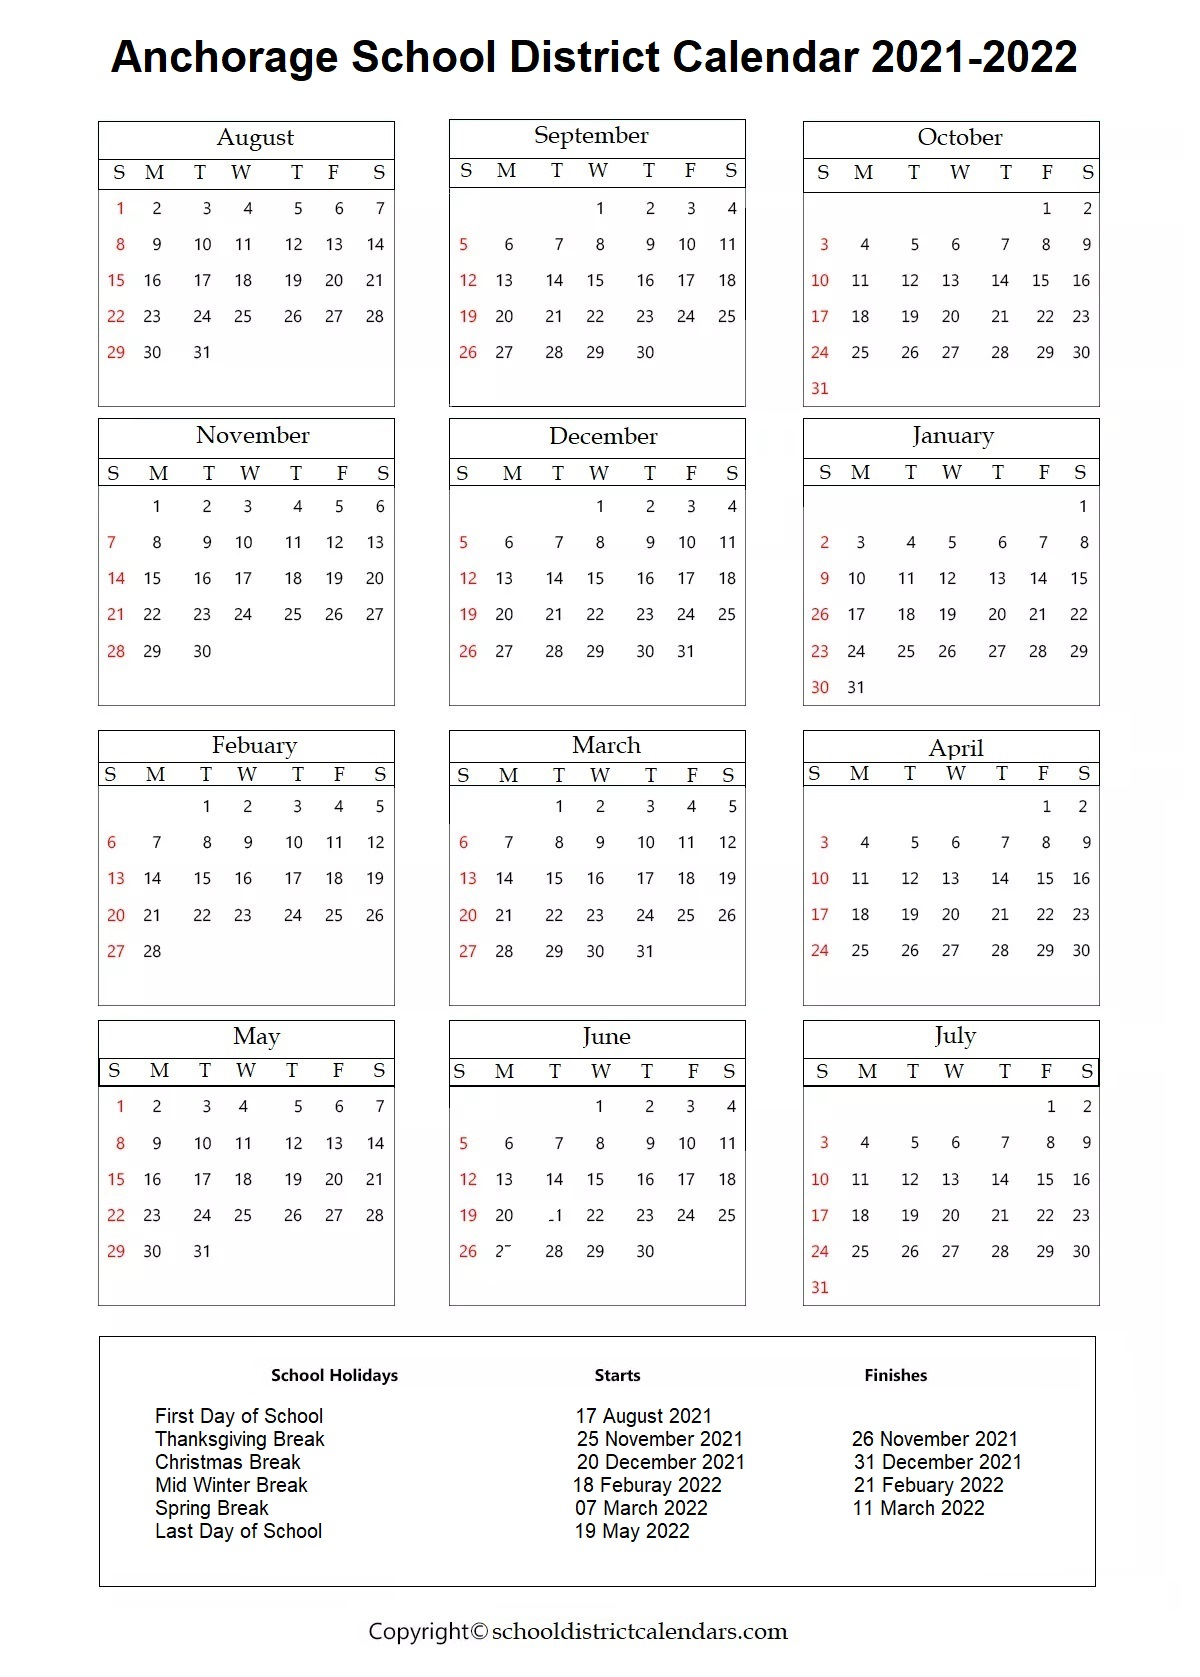 Anchorage School District, Alaska Calendar Holidays 2021-2022